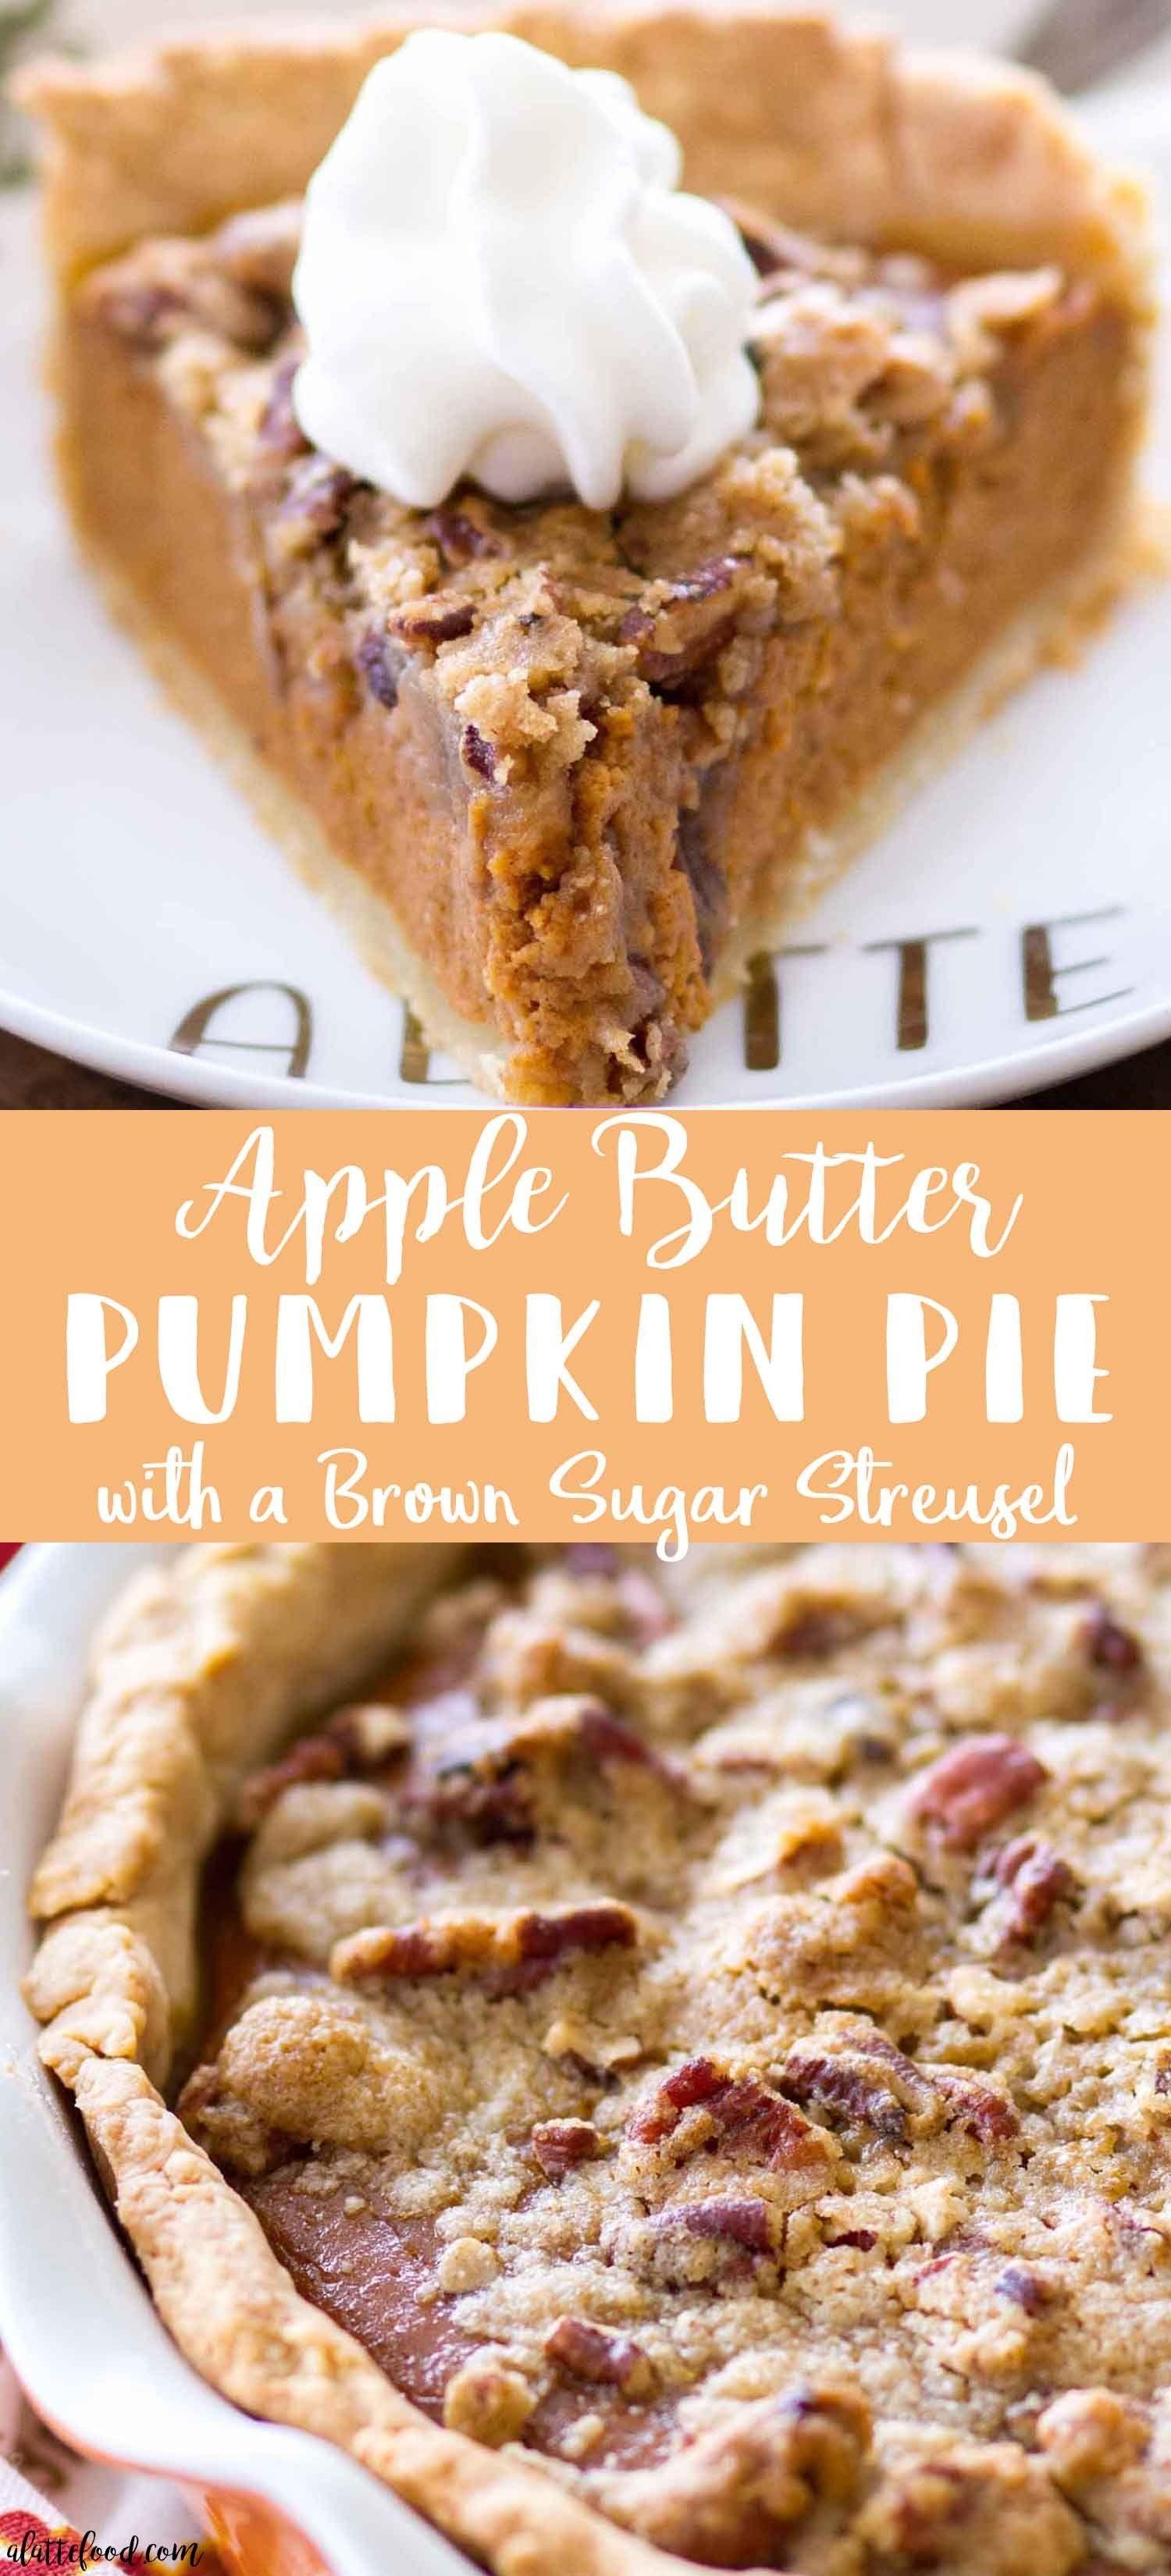 Apple Butter Pumpkin Pie with Brown Sugar Streusel #pumpkinpierecipe